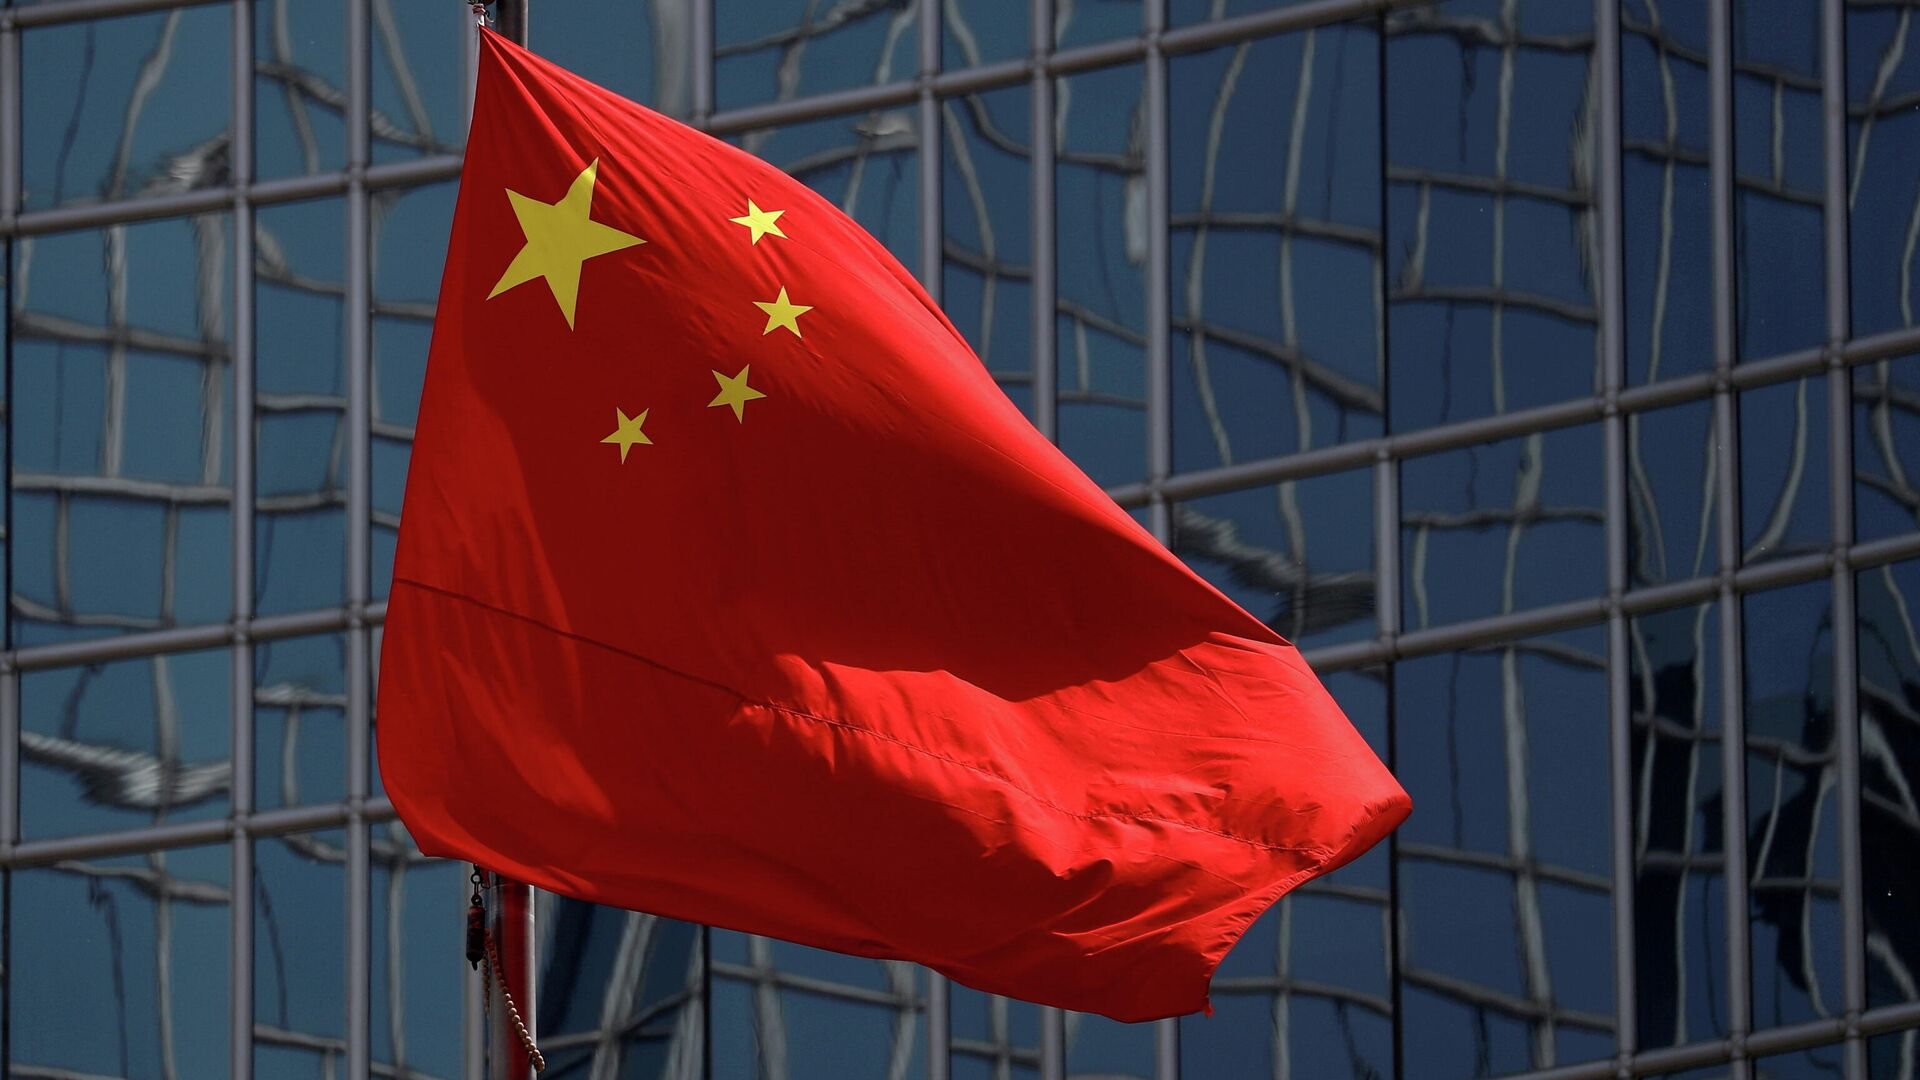 Bandera de China - Sputnik Mundo, 1920, 30.09.2021